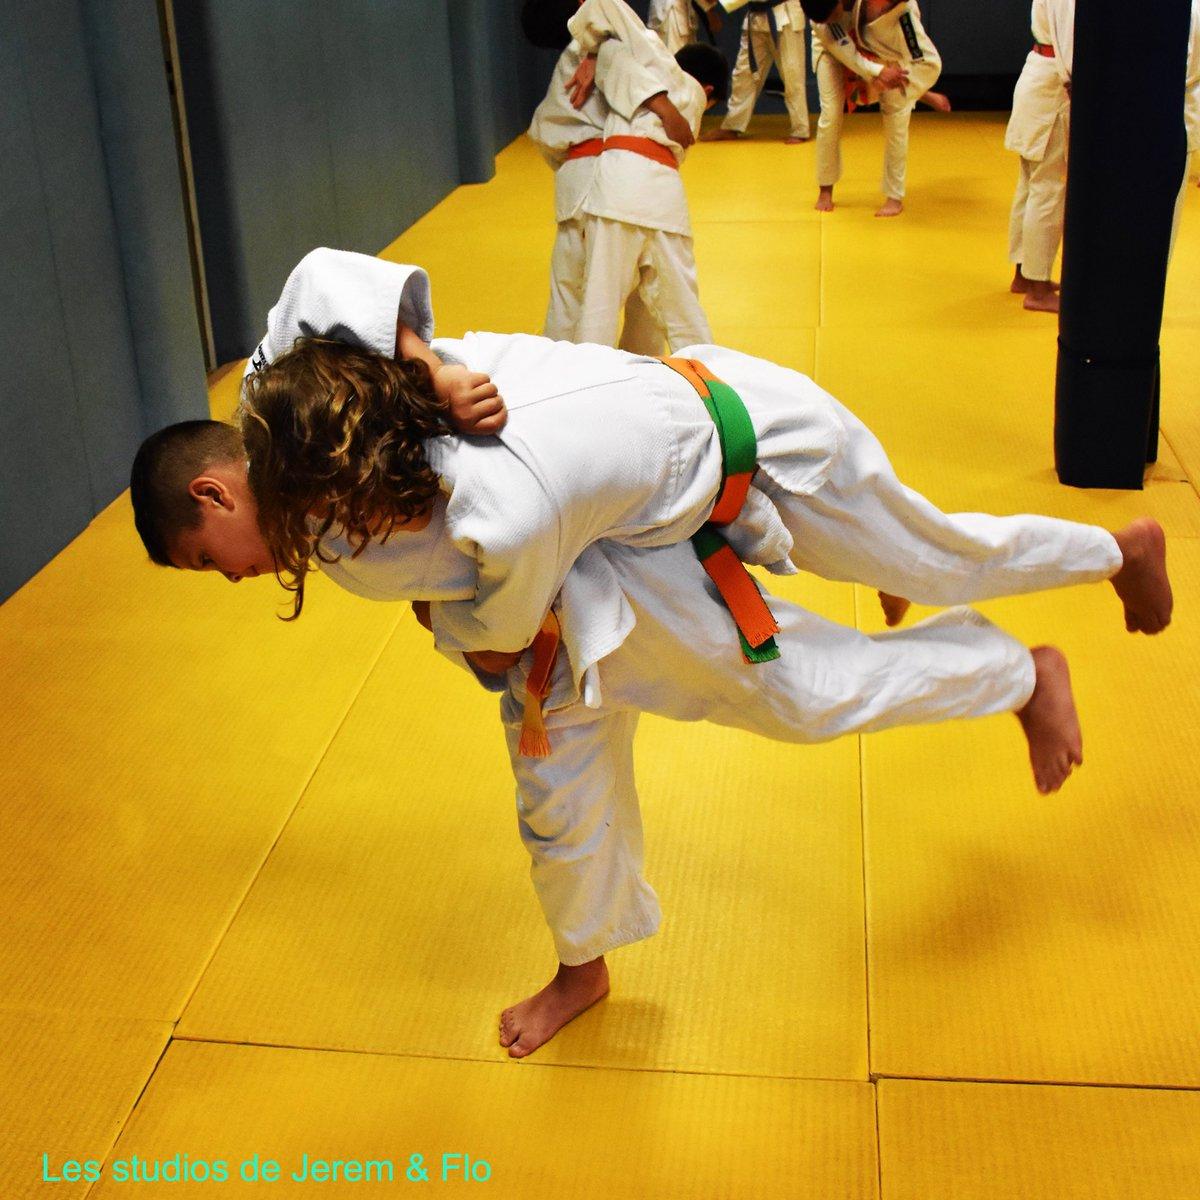 Aux Studios de Jerem & Flo, on n'est jamais fauchés.#judo #nagekomi #dojo #dojolife #martial #poudlard #judoclubdunois #haraigoshi #entrainement #martialarts #littlechampions #workinprogress #kimono #eyeofthetiger #picoftheday #sportmotivation #sportoftheday  - FestivalFocus